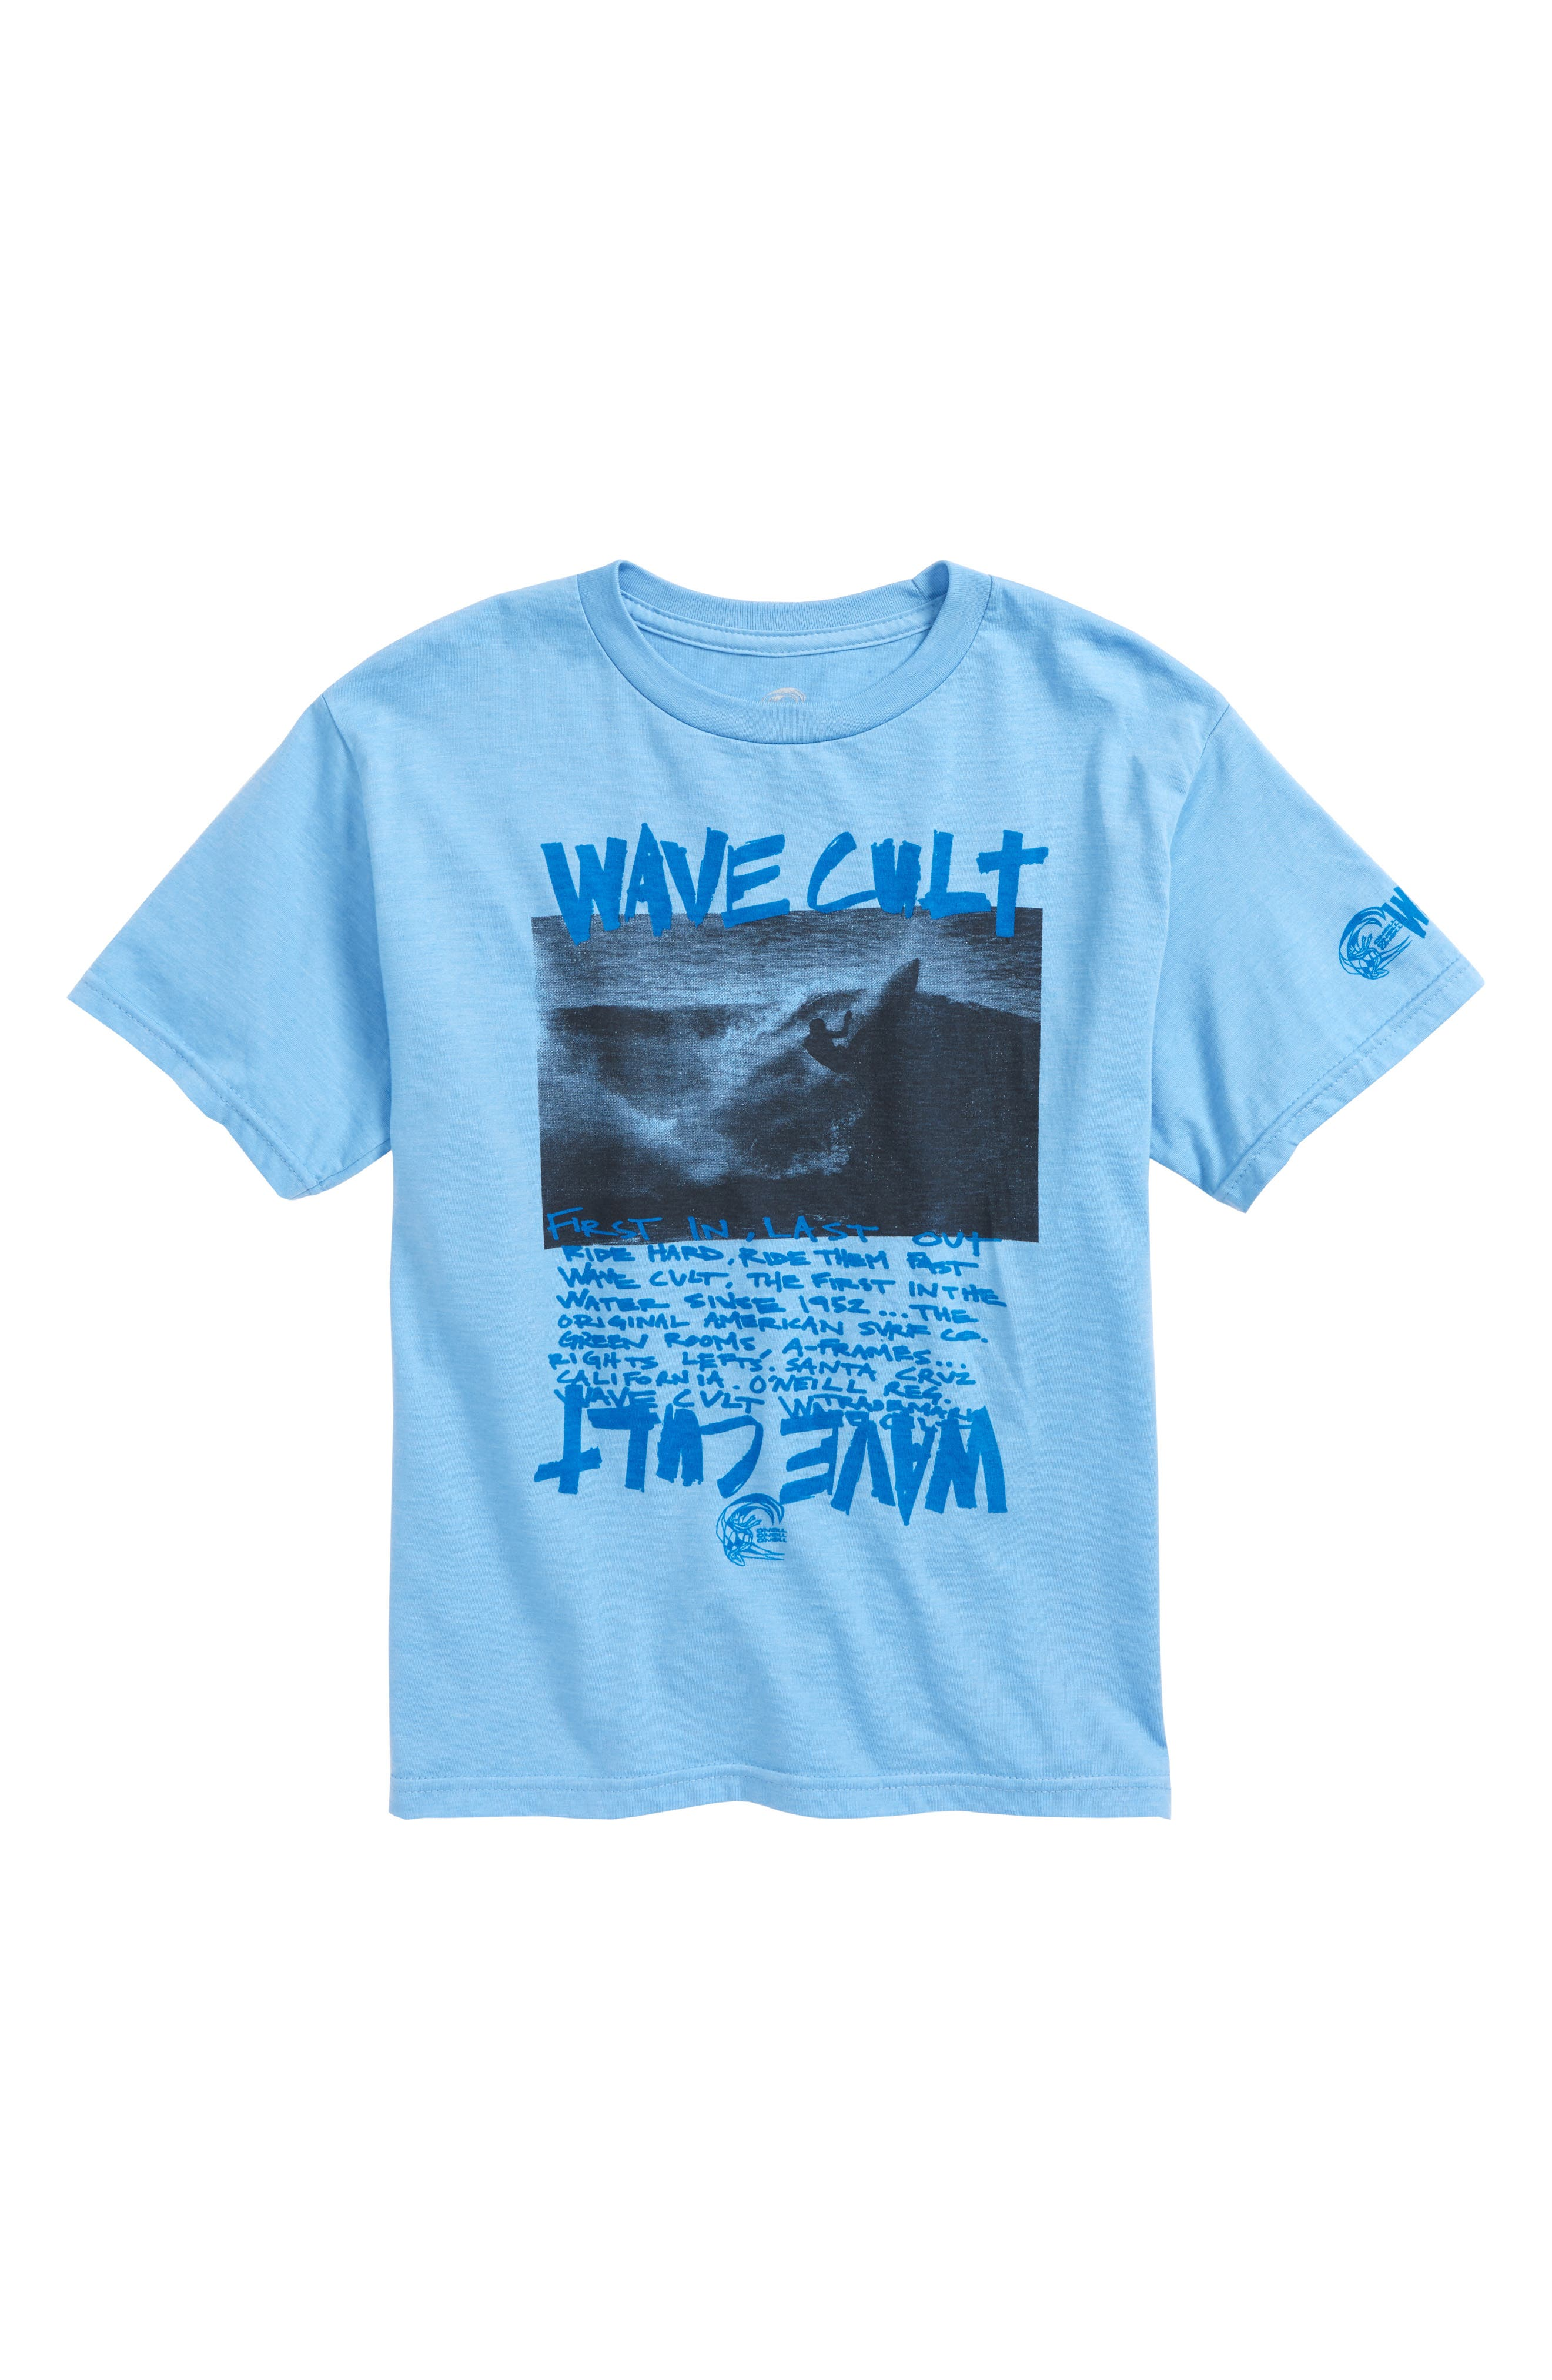 Wave Cult T-Shirt,                         Main,                         color, Light Blue Heather